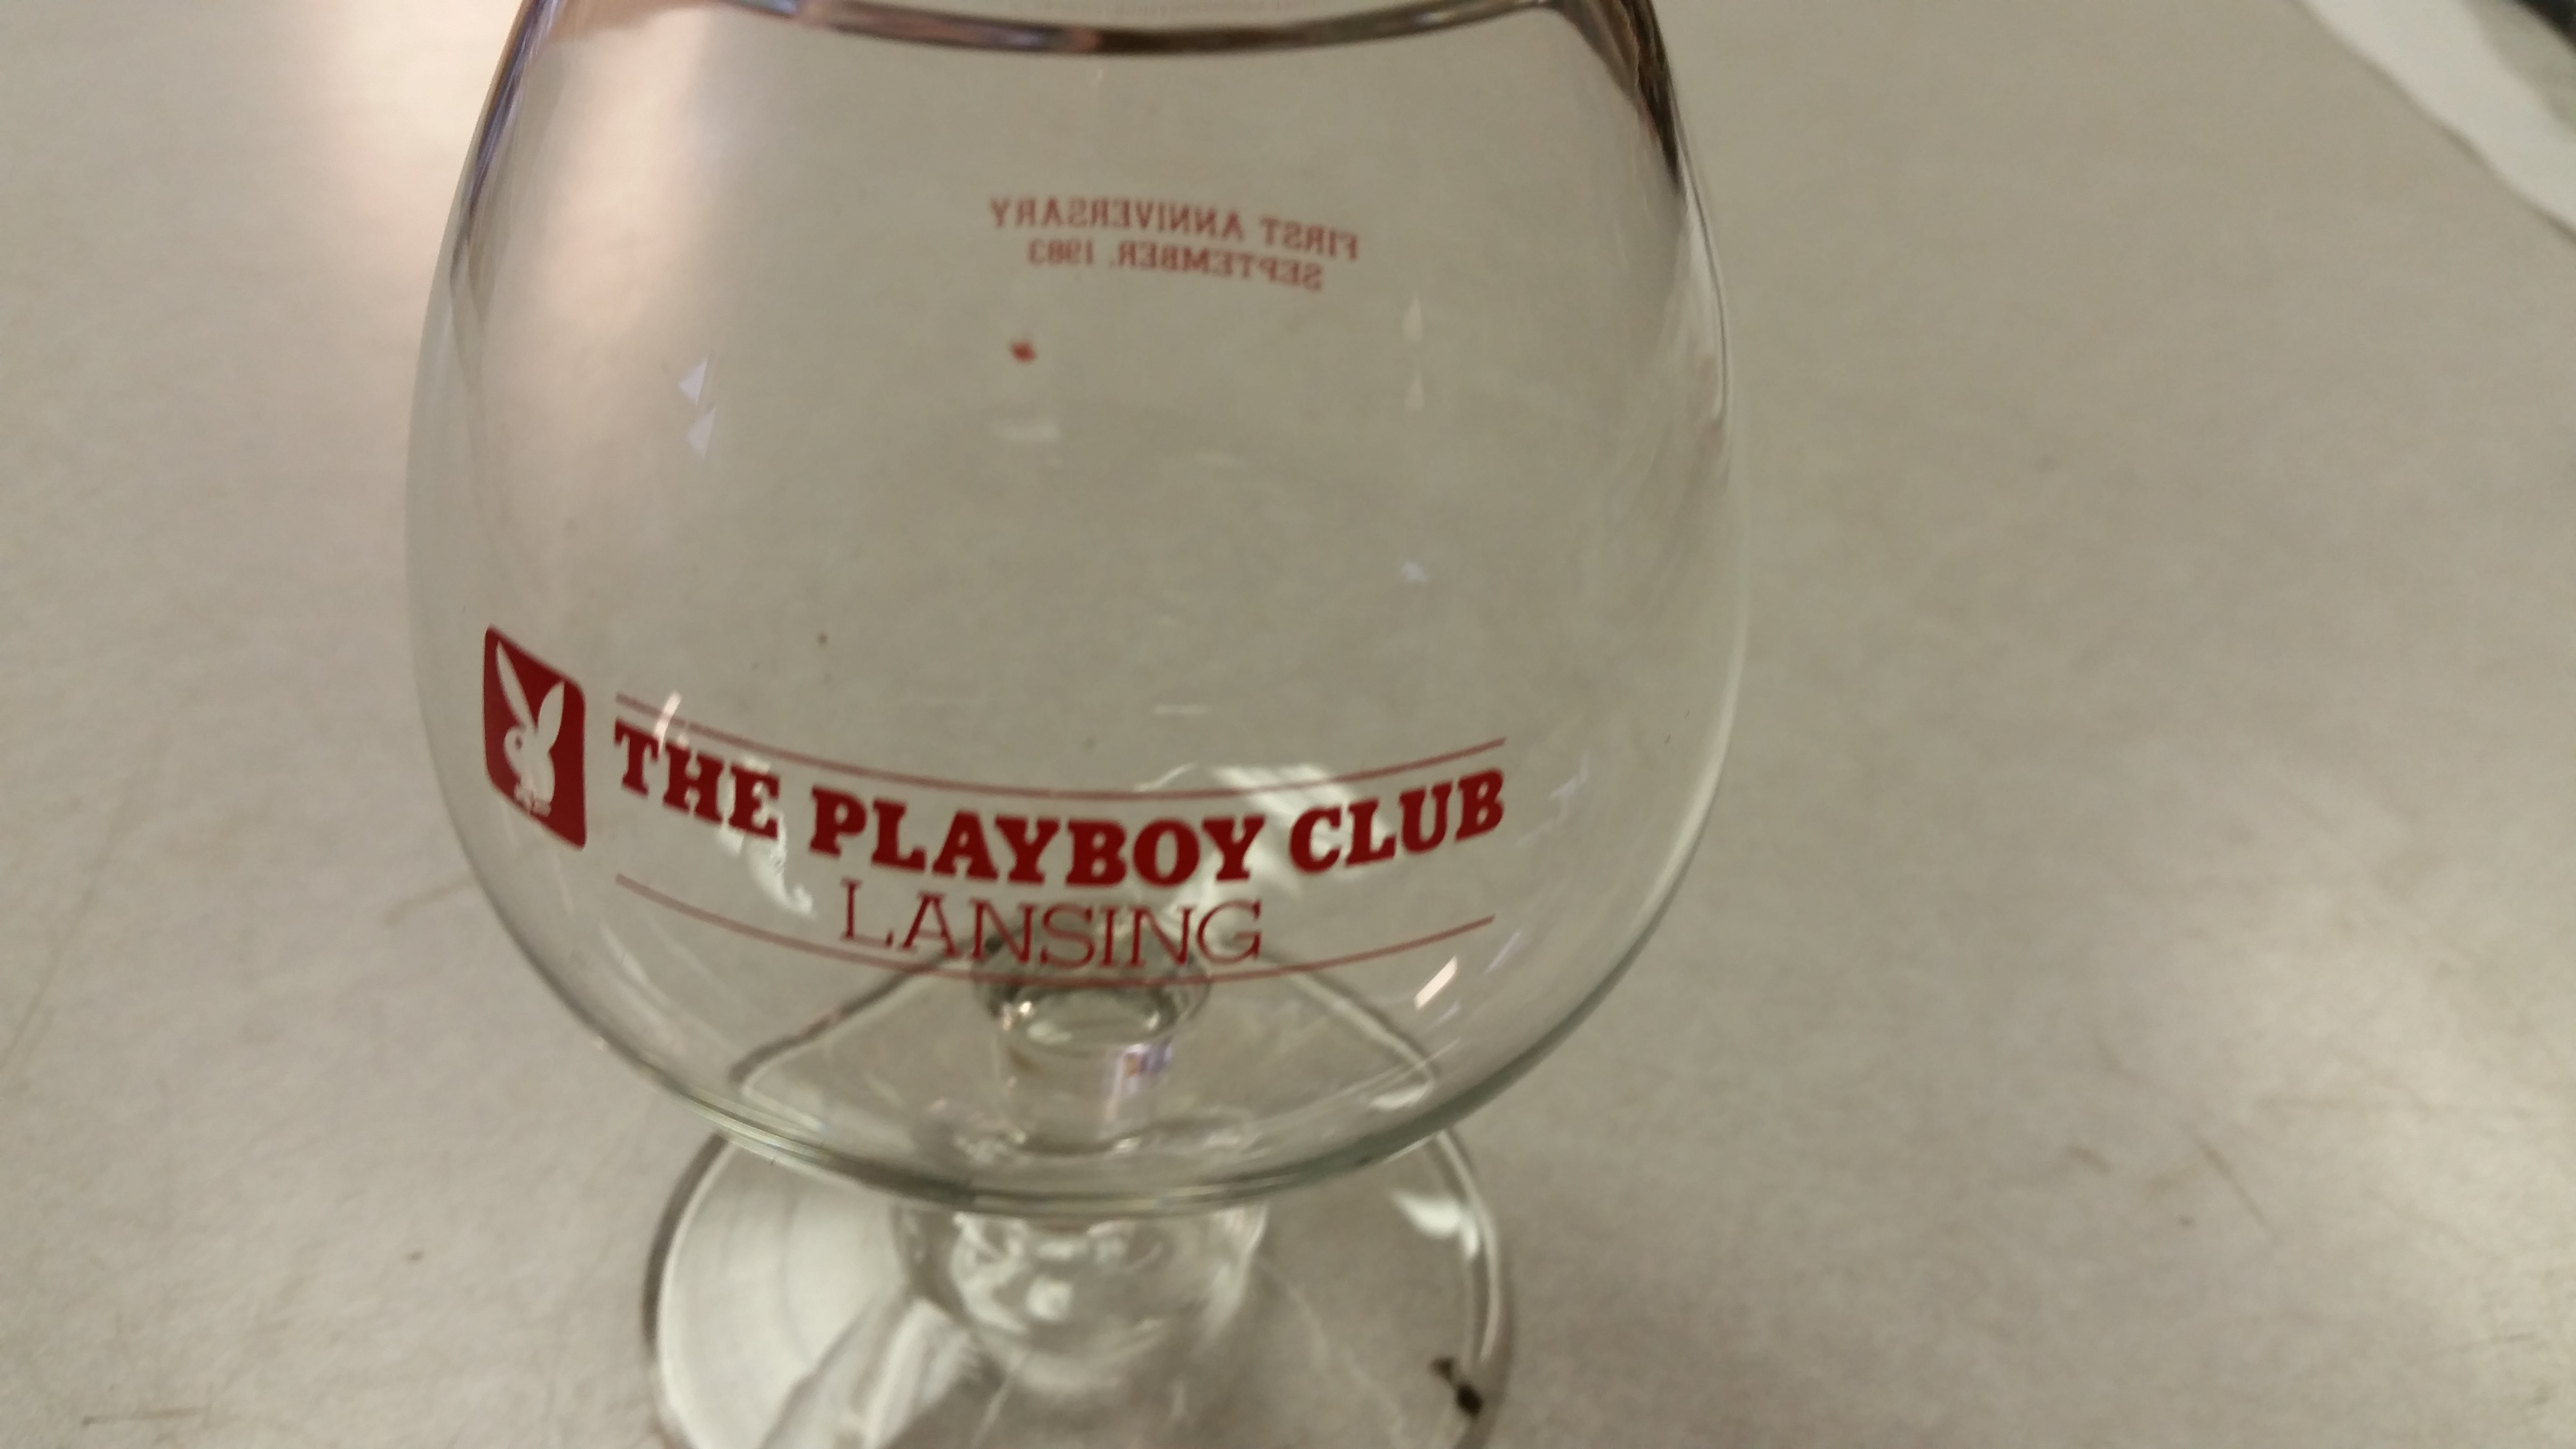 Playboy Club Lansing Brandy Snifter 1st Anniversary 1983